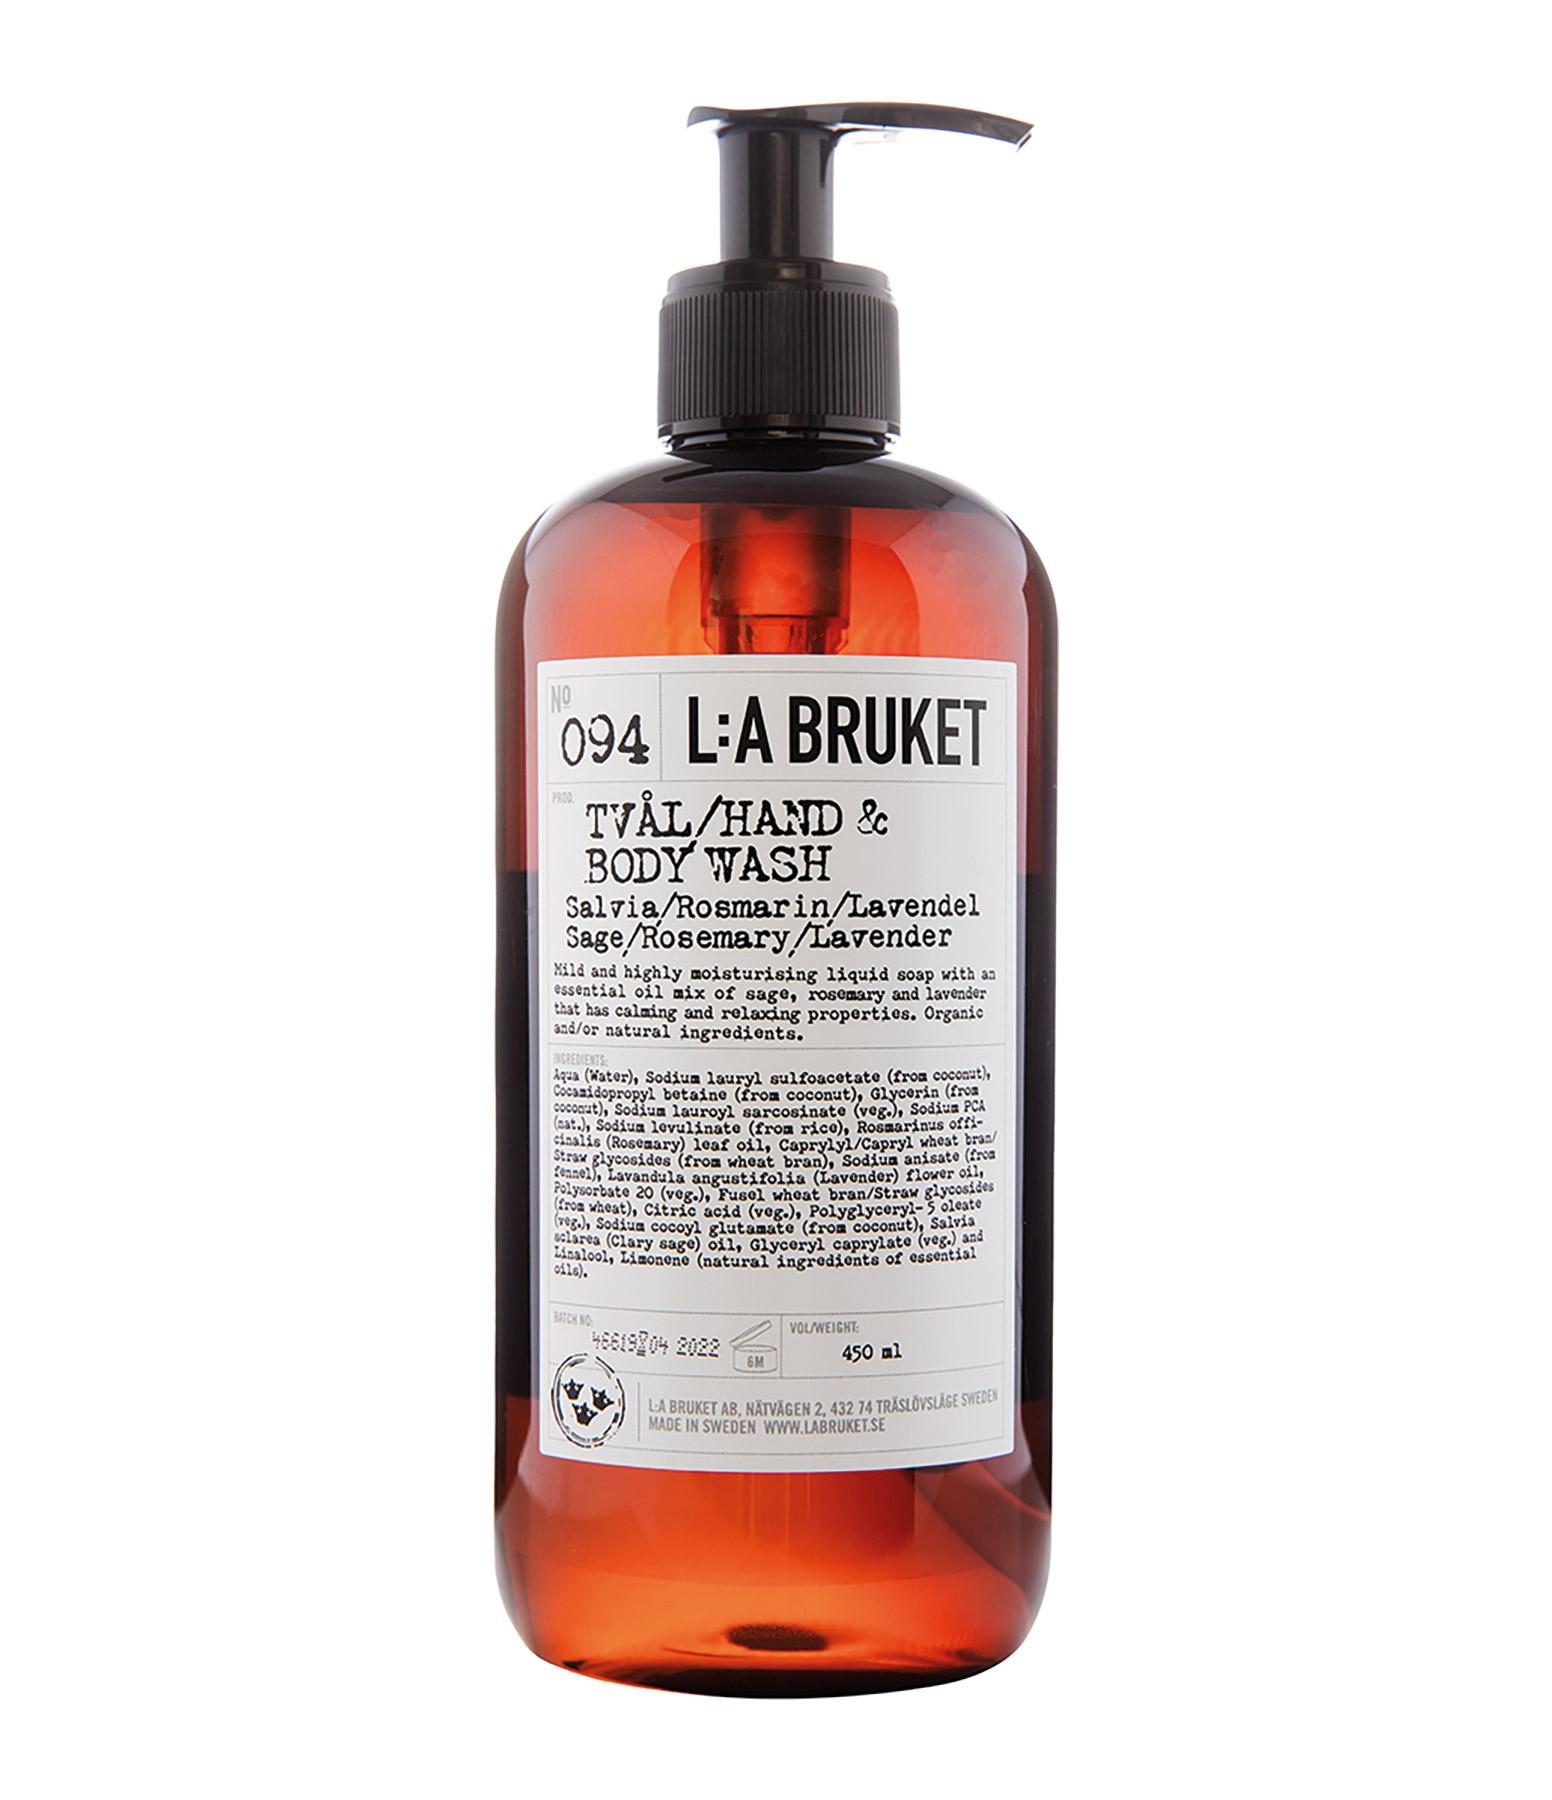 L:A BRUKET - Savon Liquide Sauge Romarin Lavande 450ml N°094